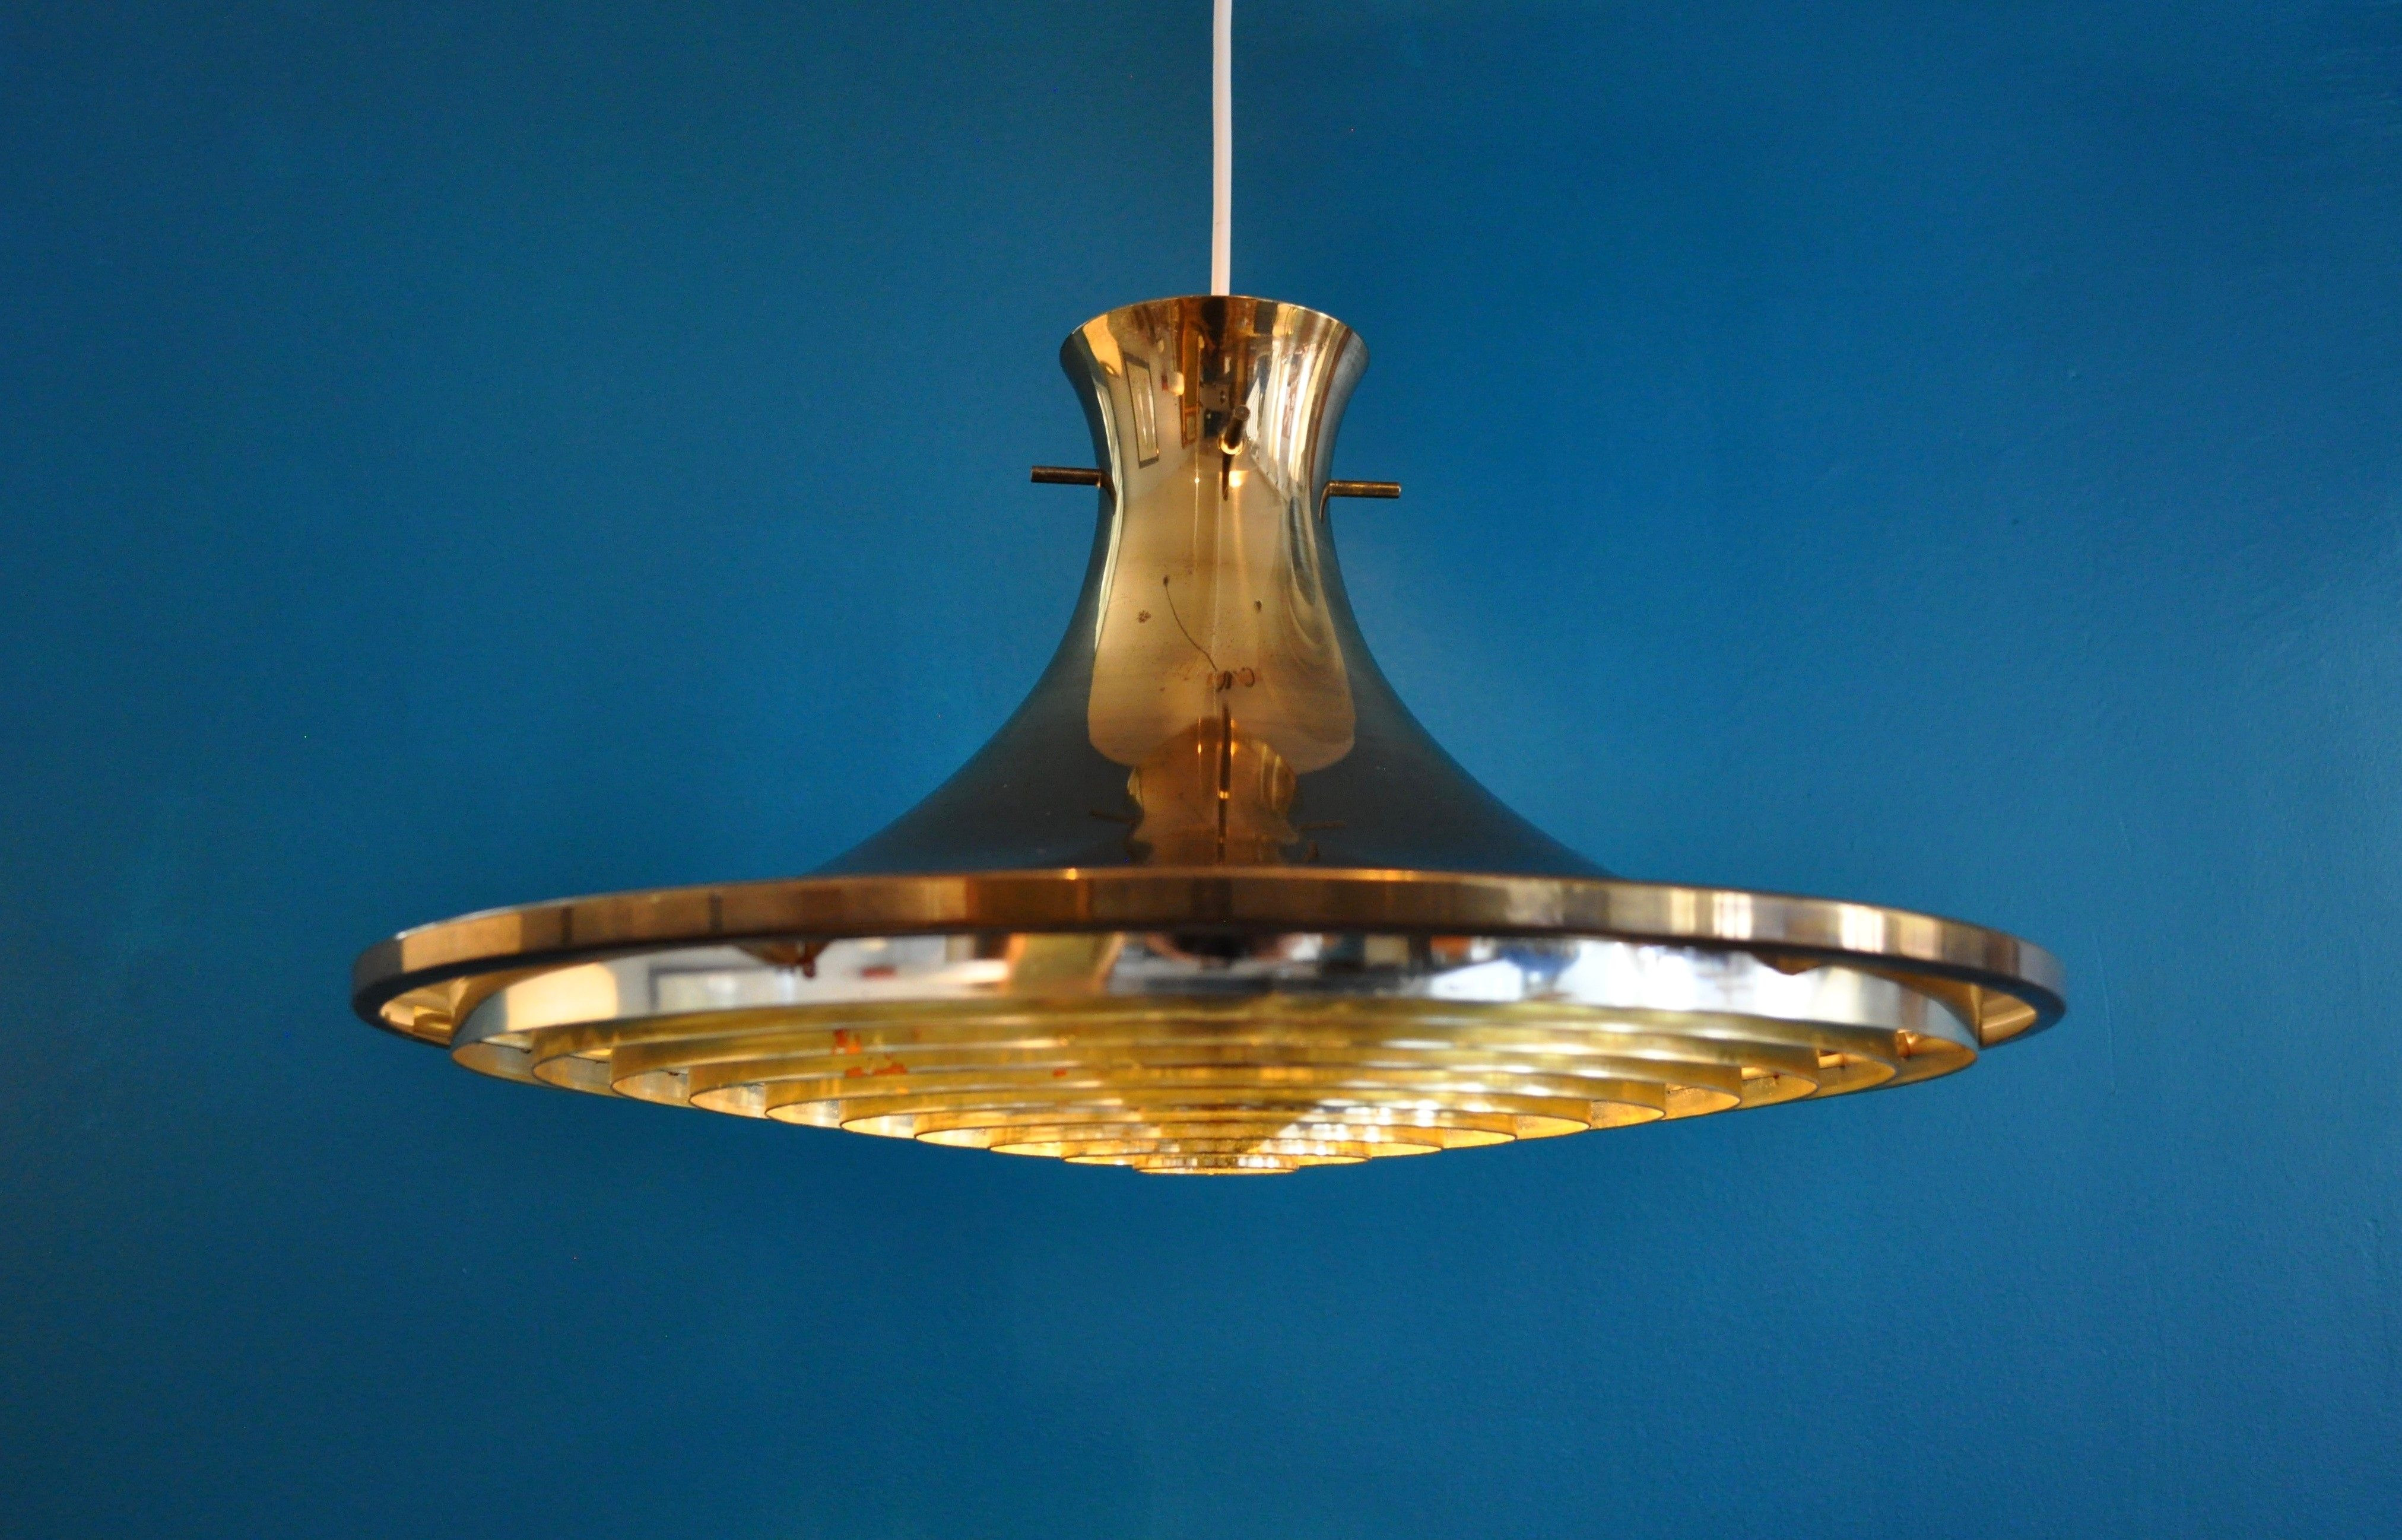 Ikea Applique Salle De Bain Frais Photos Luminaires Appliques Murales Projet – Sullivanmaxx